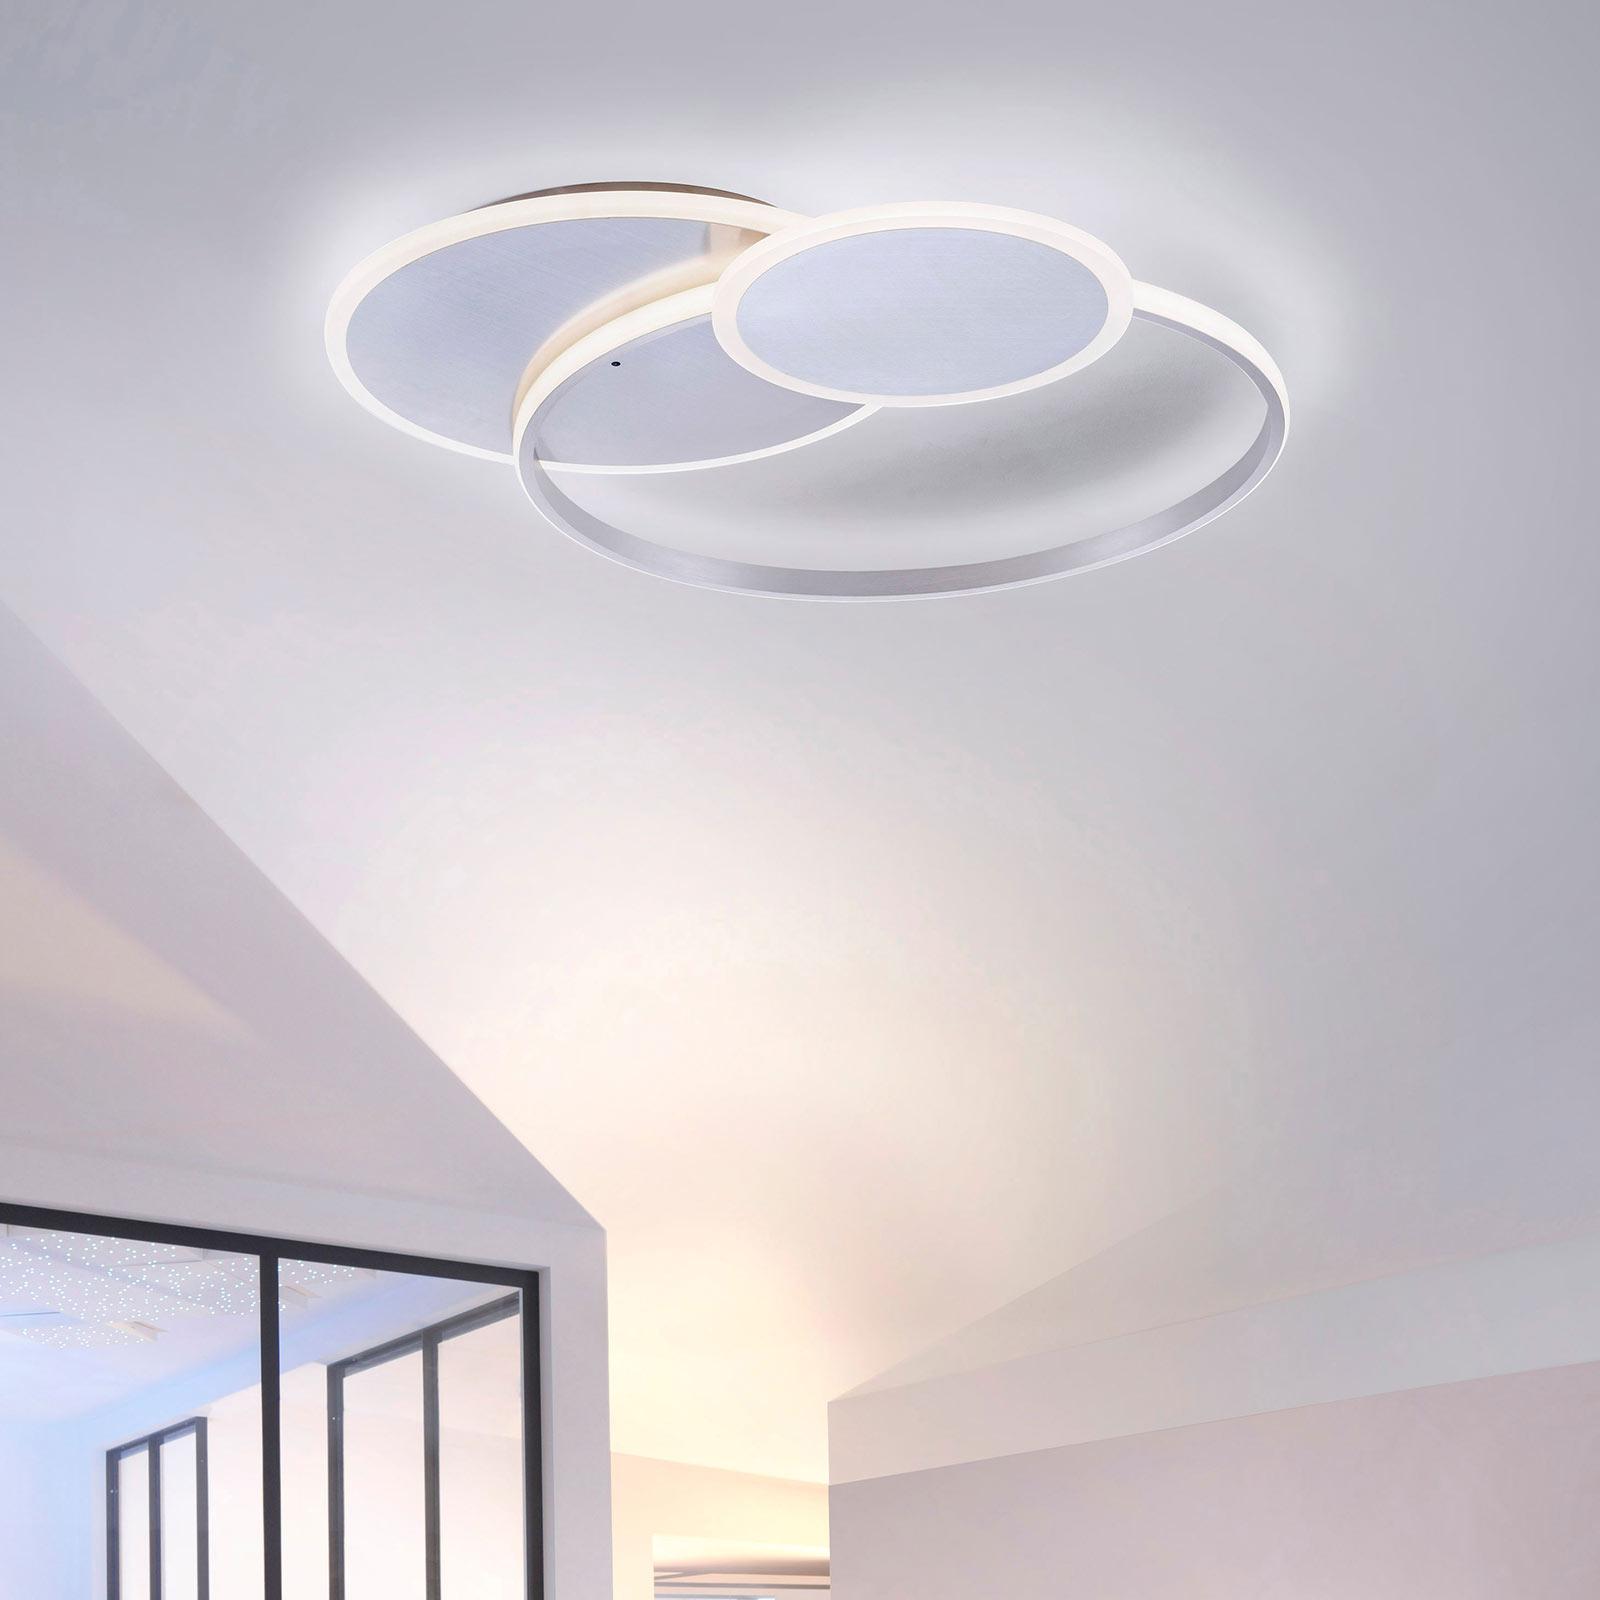 LED-taklampe Emilio med fjernkontroll, rund